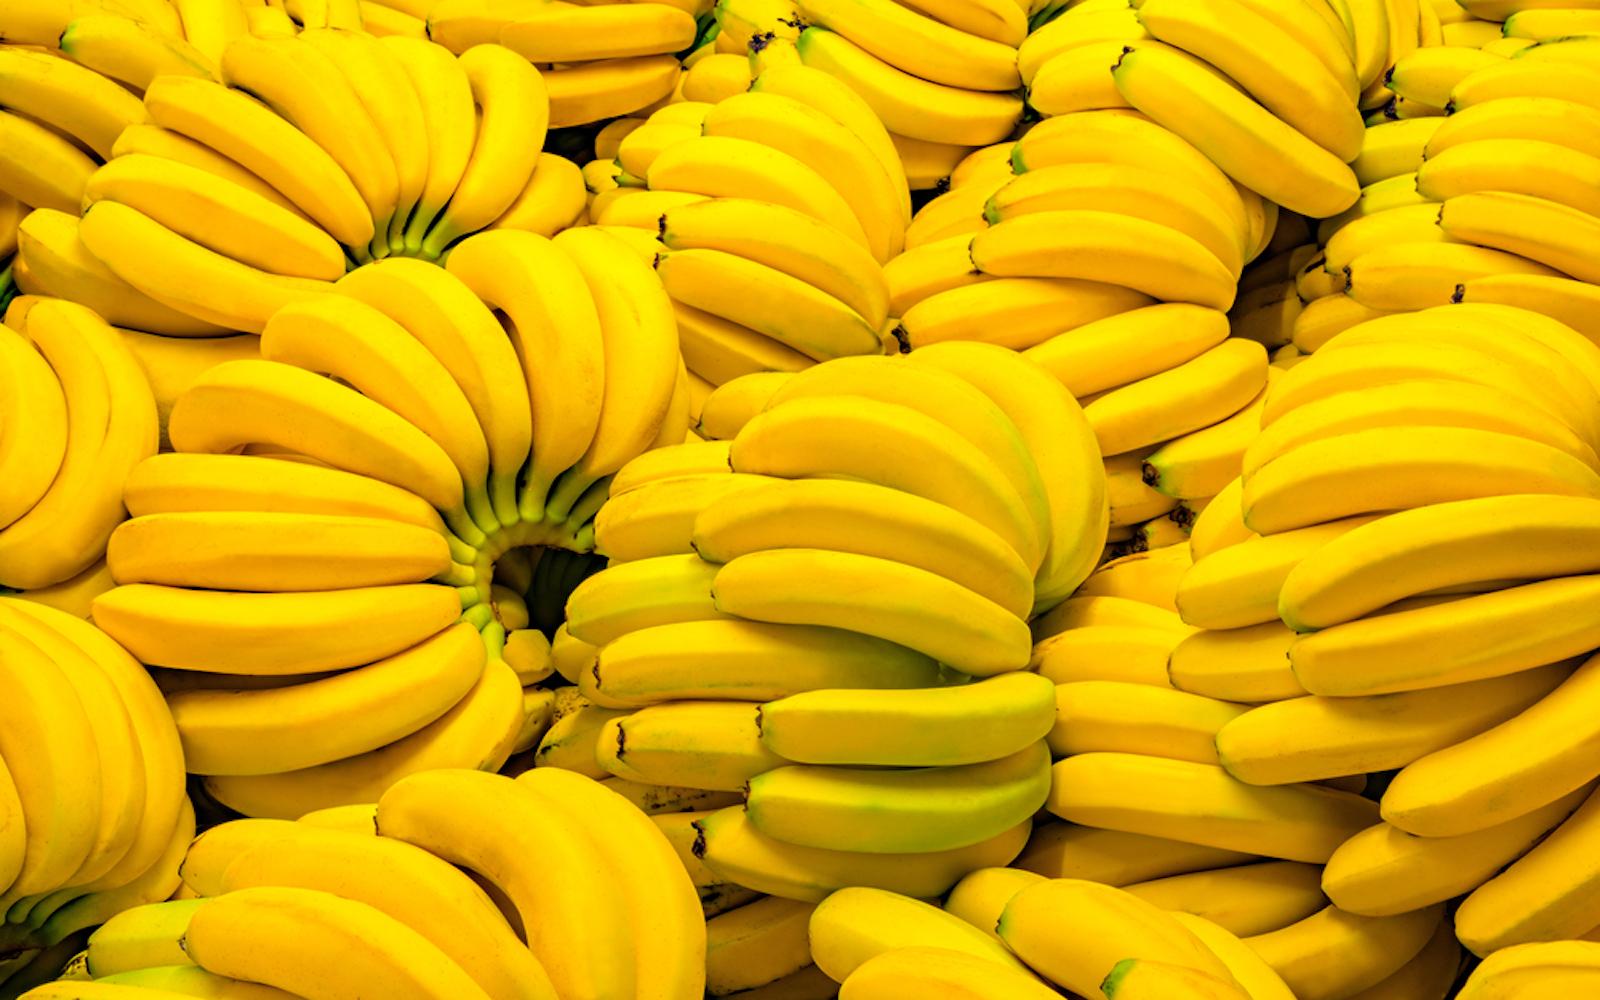 ripe-unripe-bananas